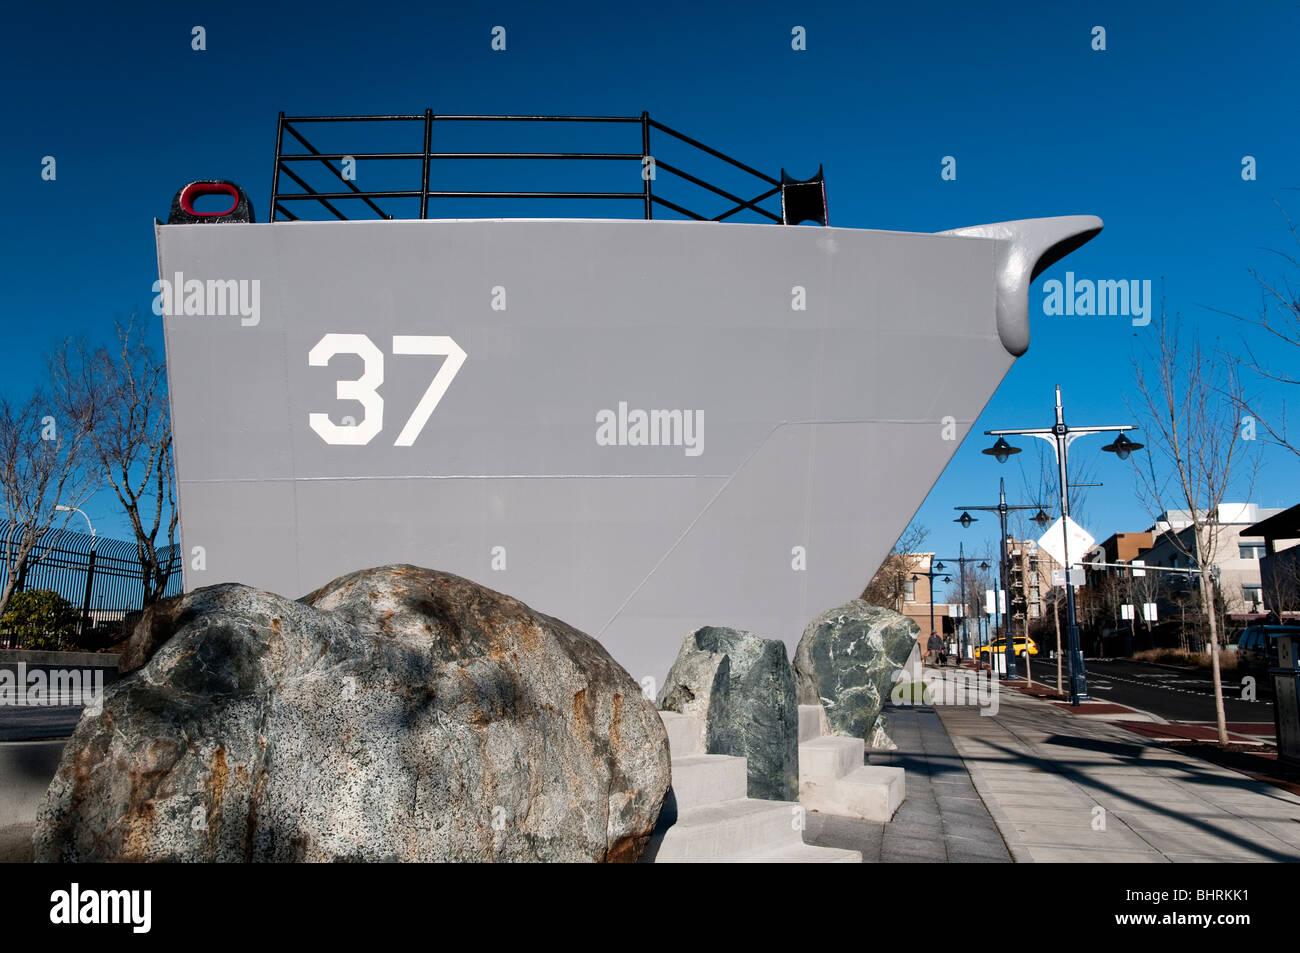 US navy submarine monument outside the Bremerton Naval Museum, Bremerton, Washington, USA - Stock Image